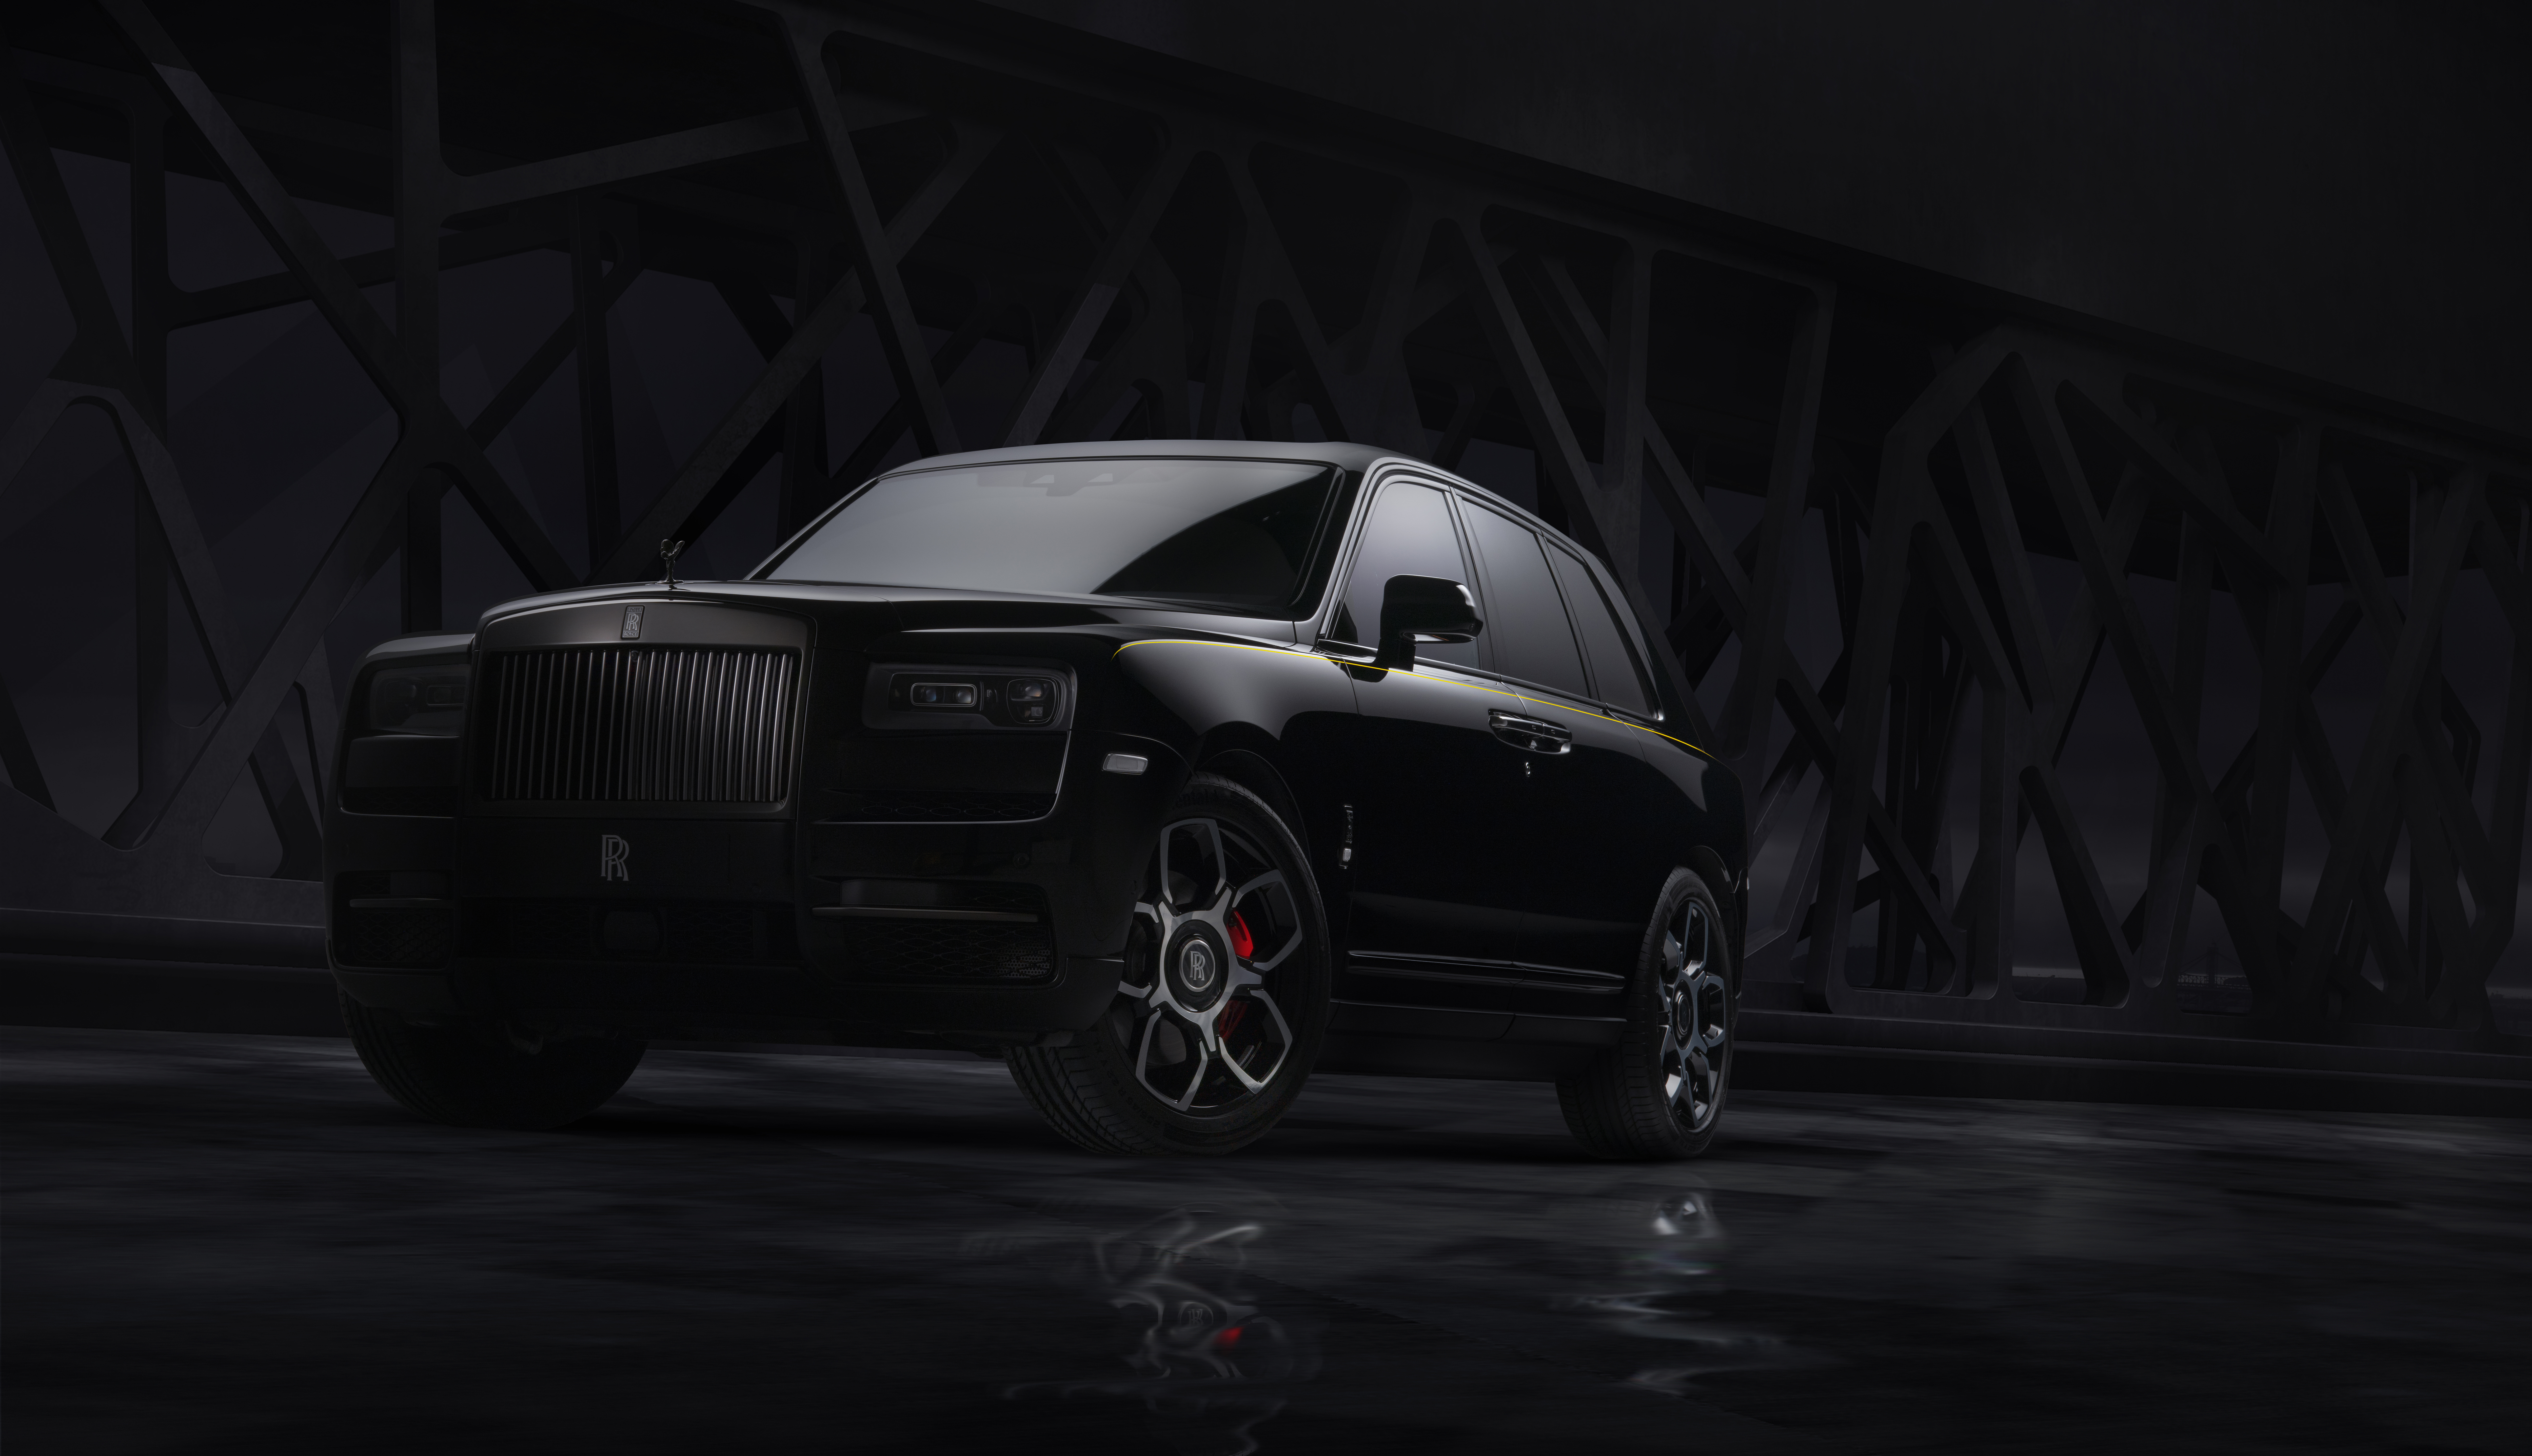 rolls royce cullinan black badge 2019 1574936476 - Rolls Royce Cullinan Black Badge 2019 -